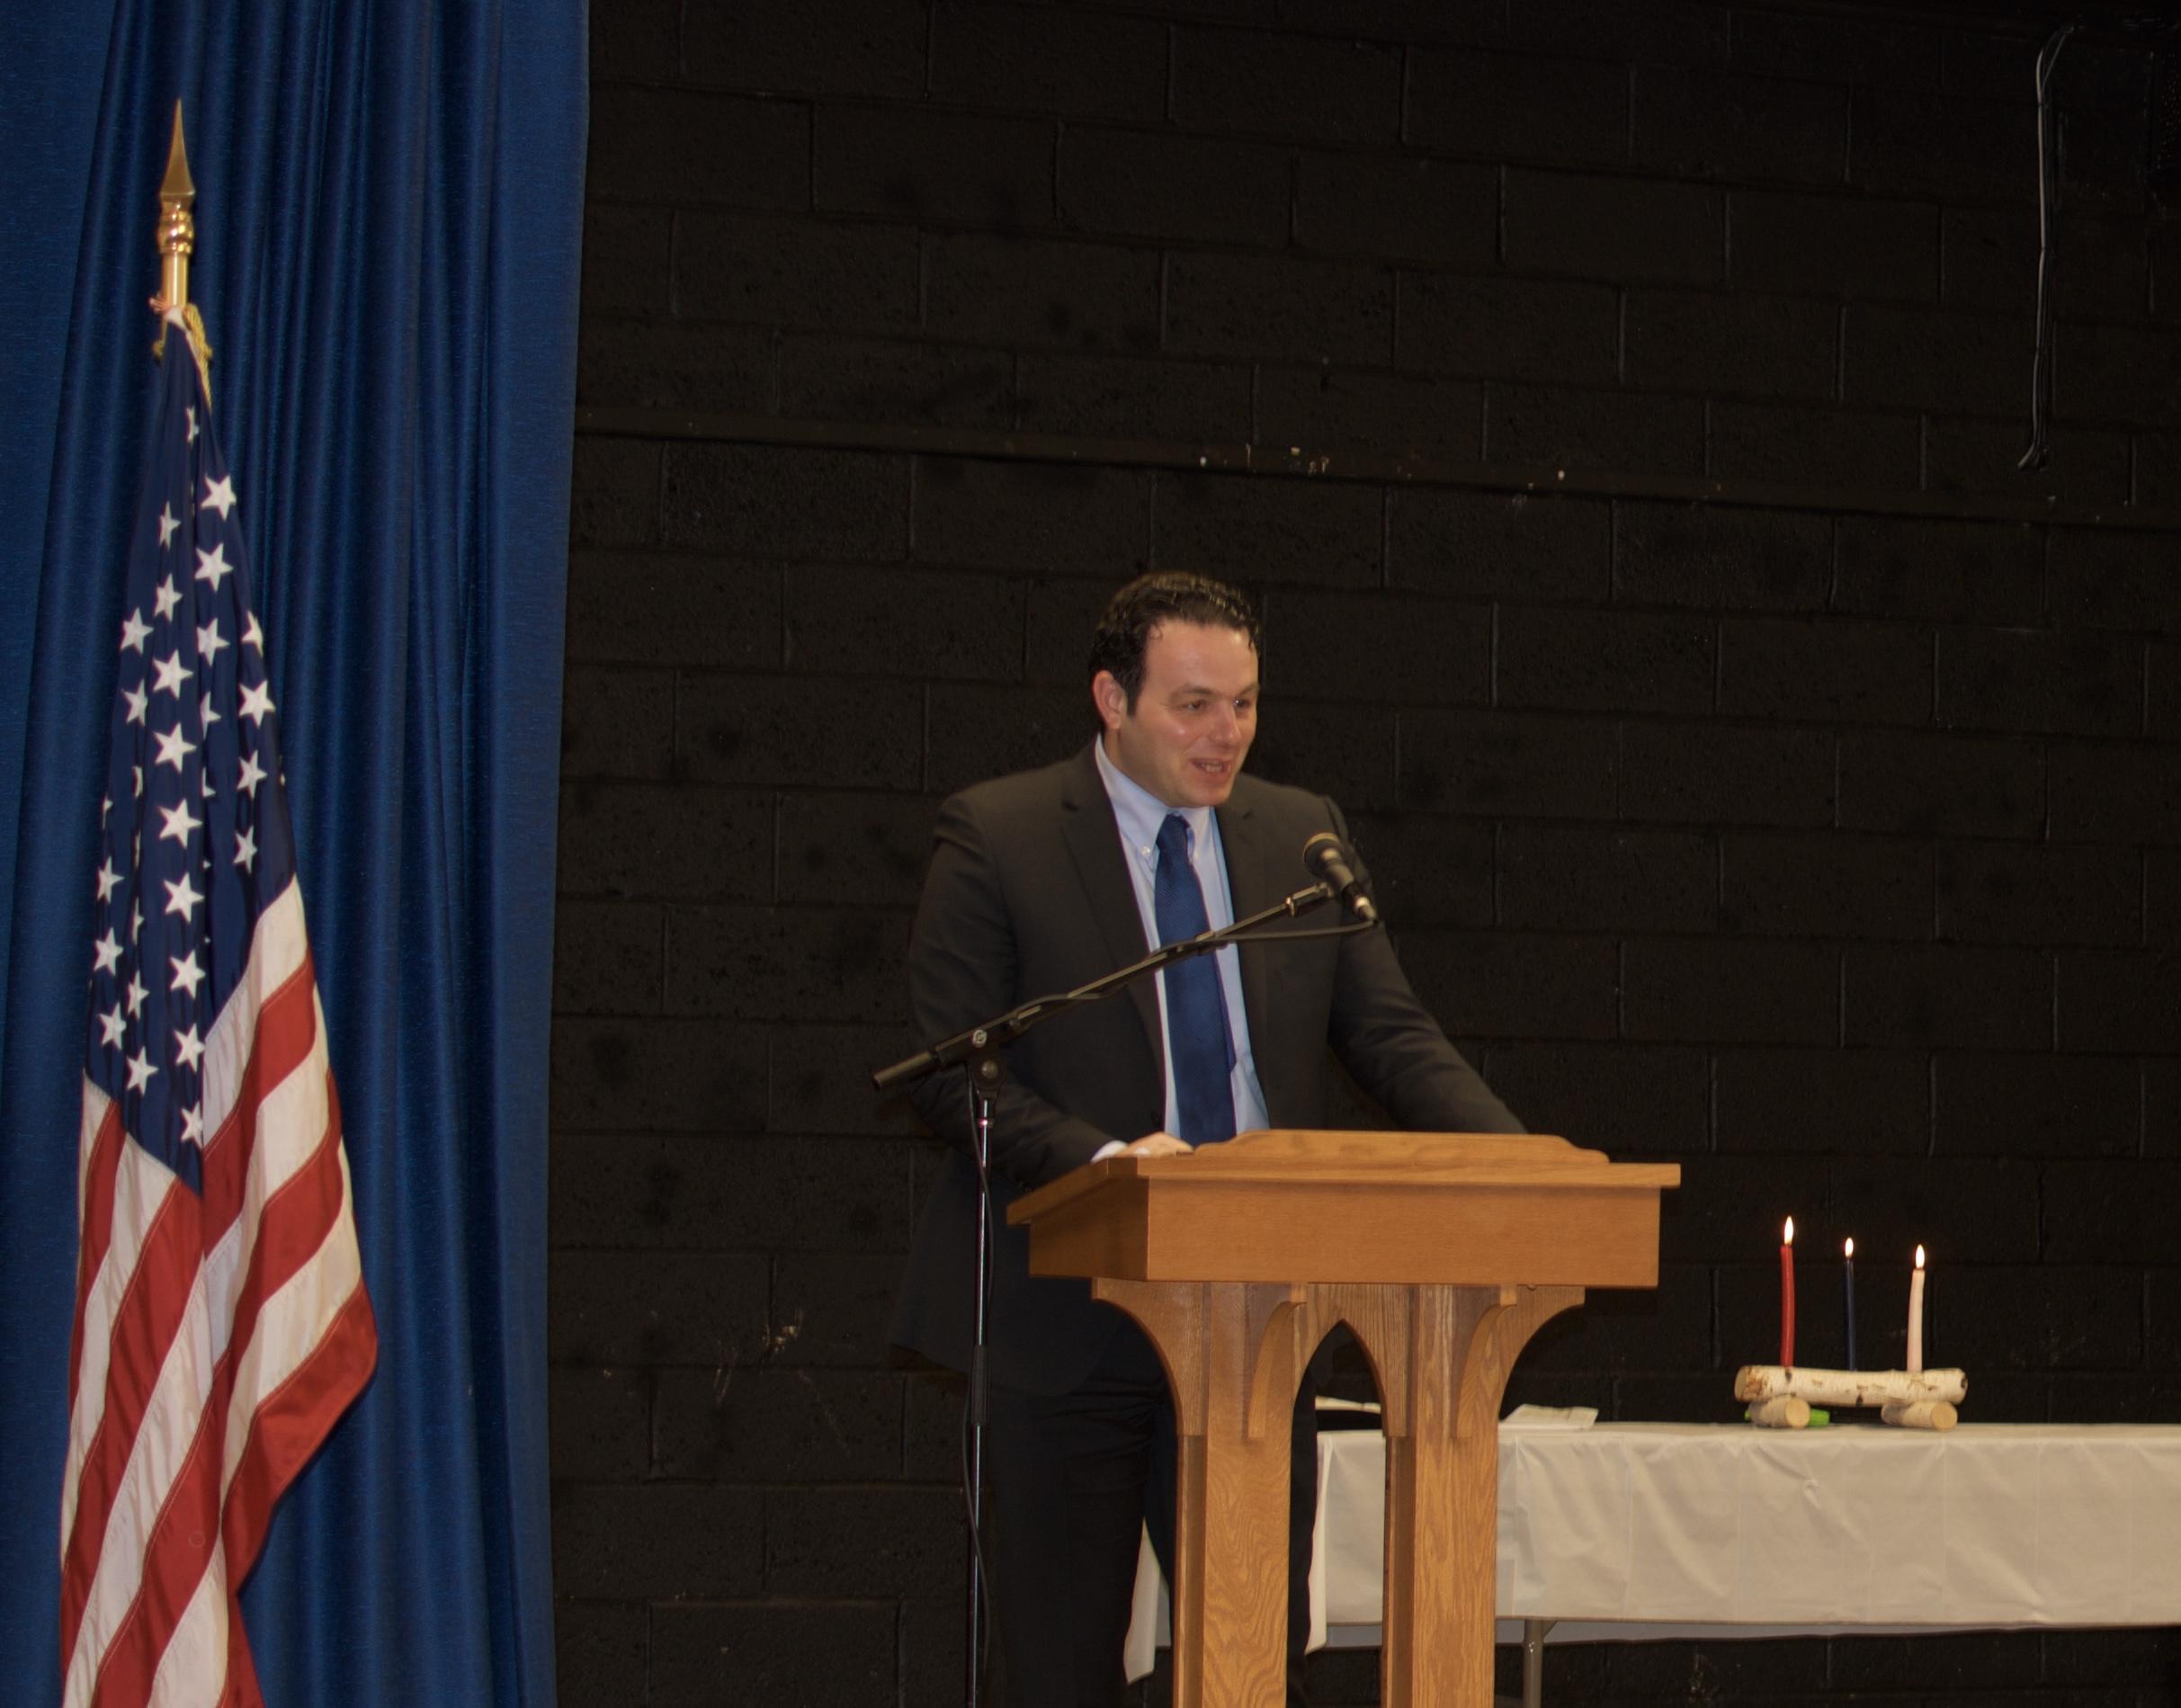 Councilman Sayegh